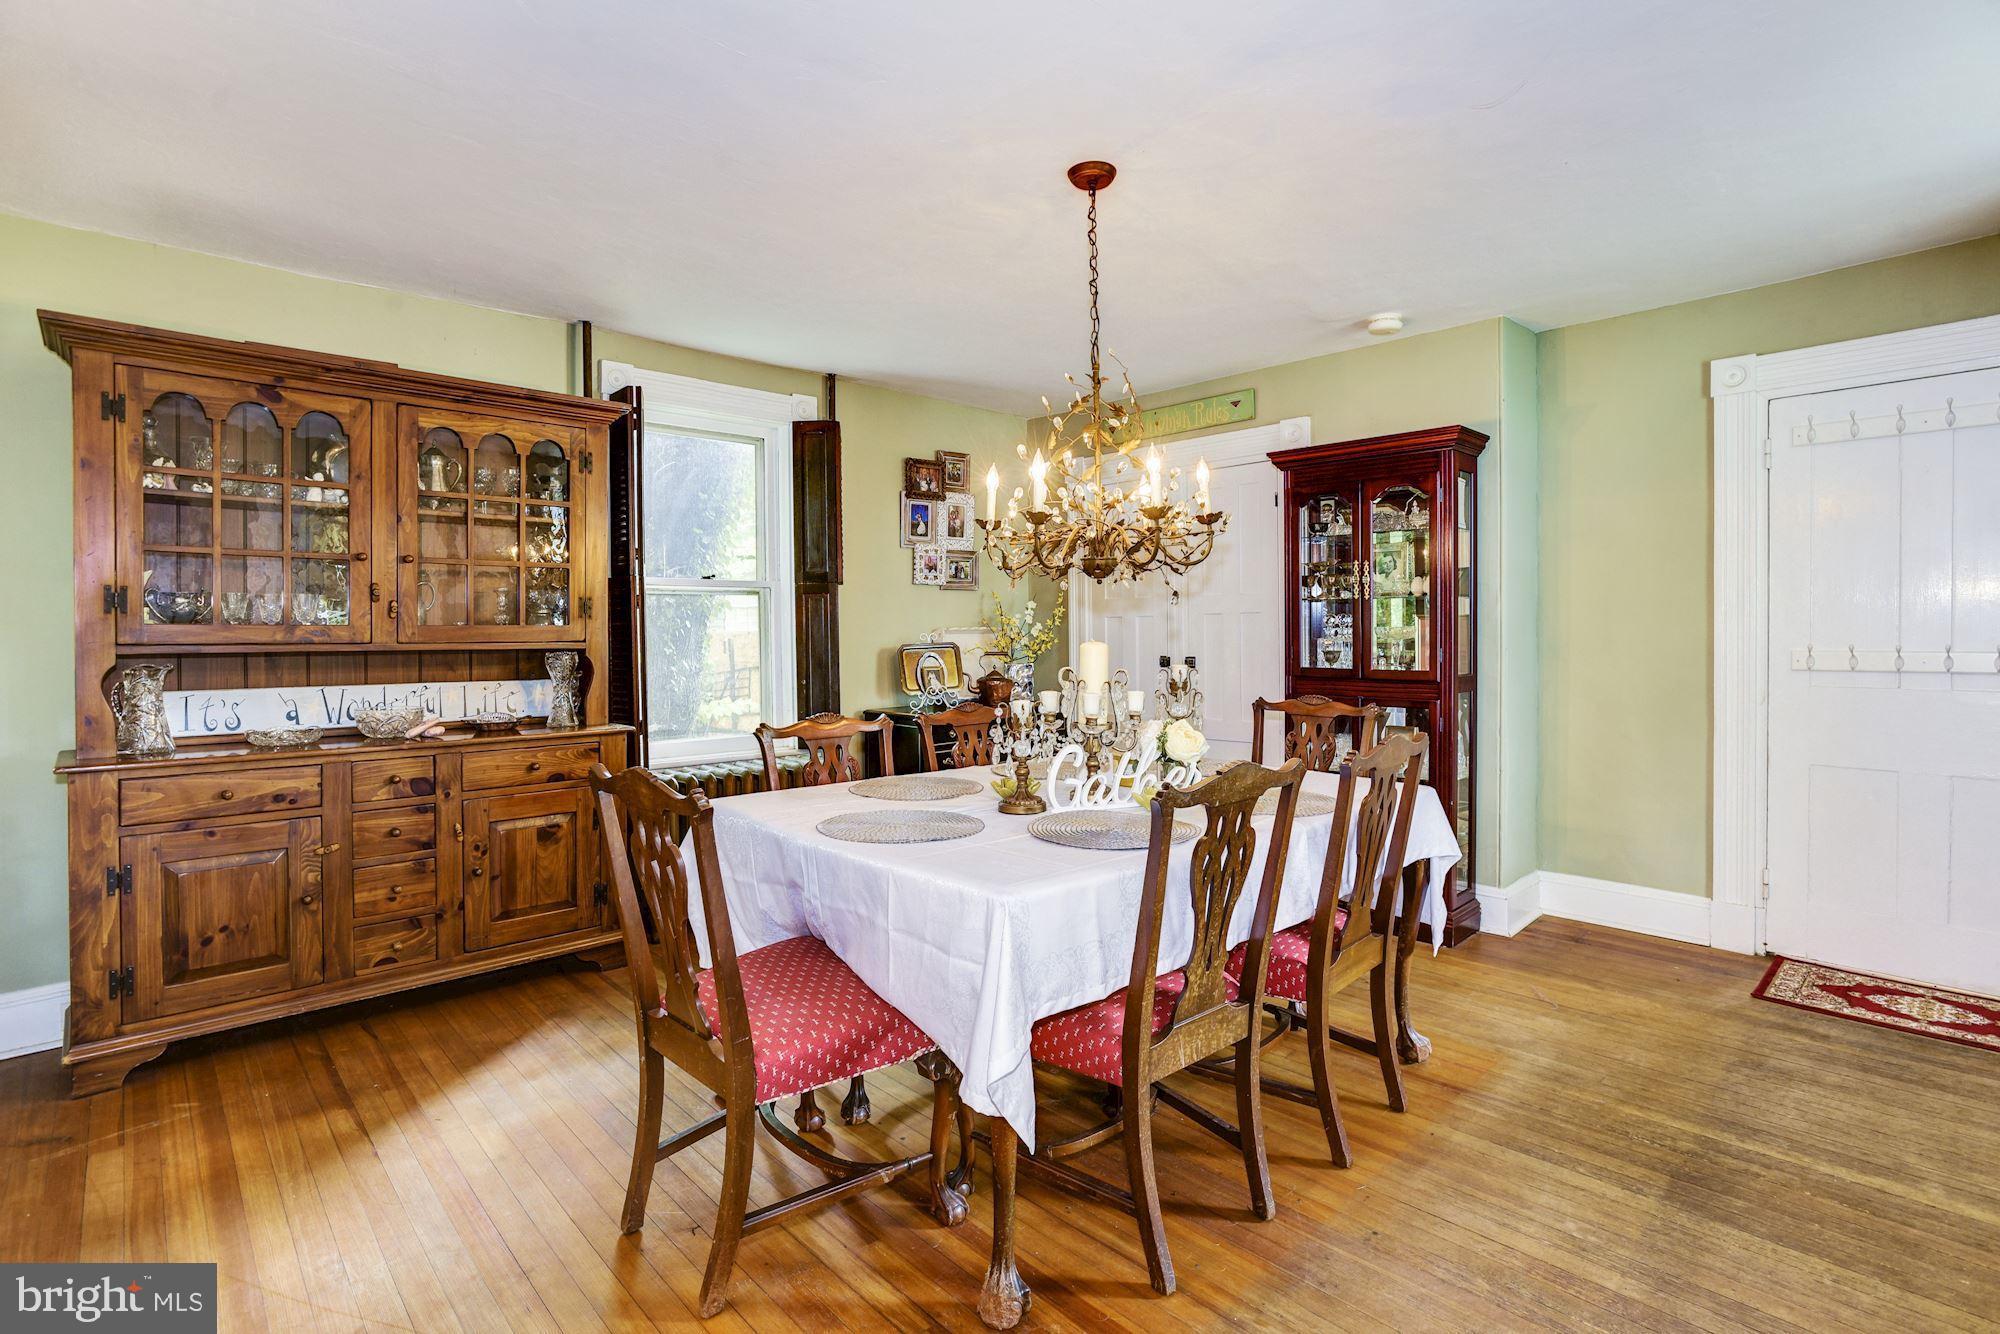 Original Cabinetry has pass thru to Kitchen